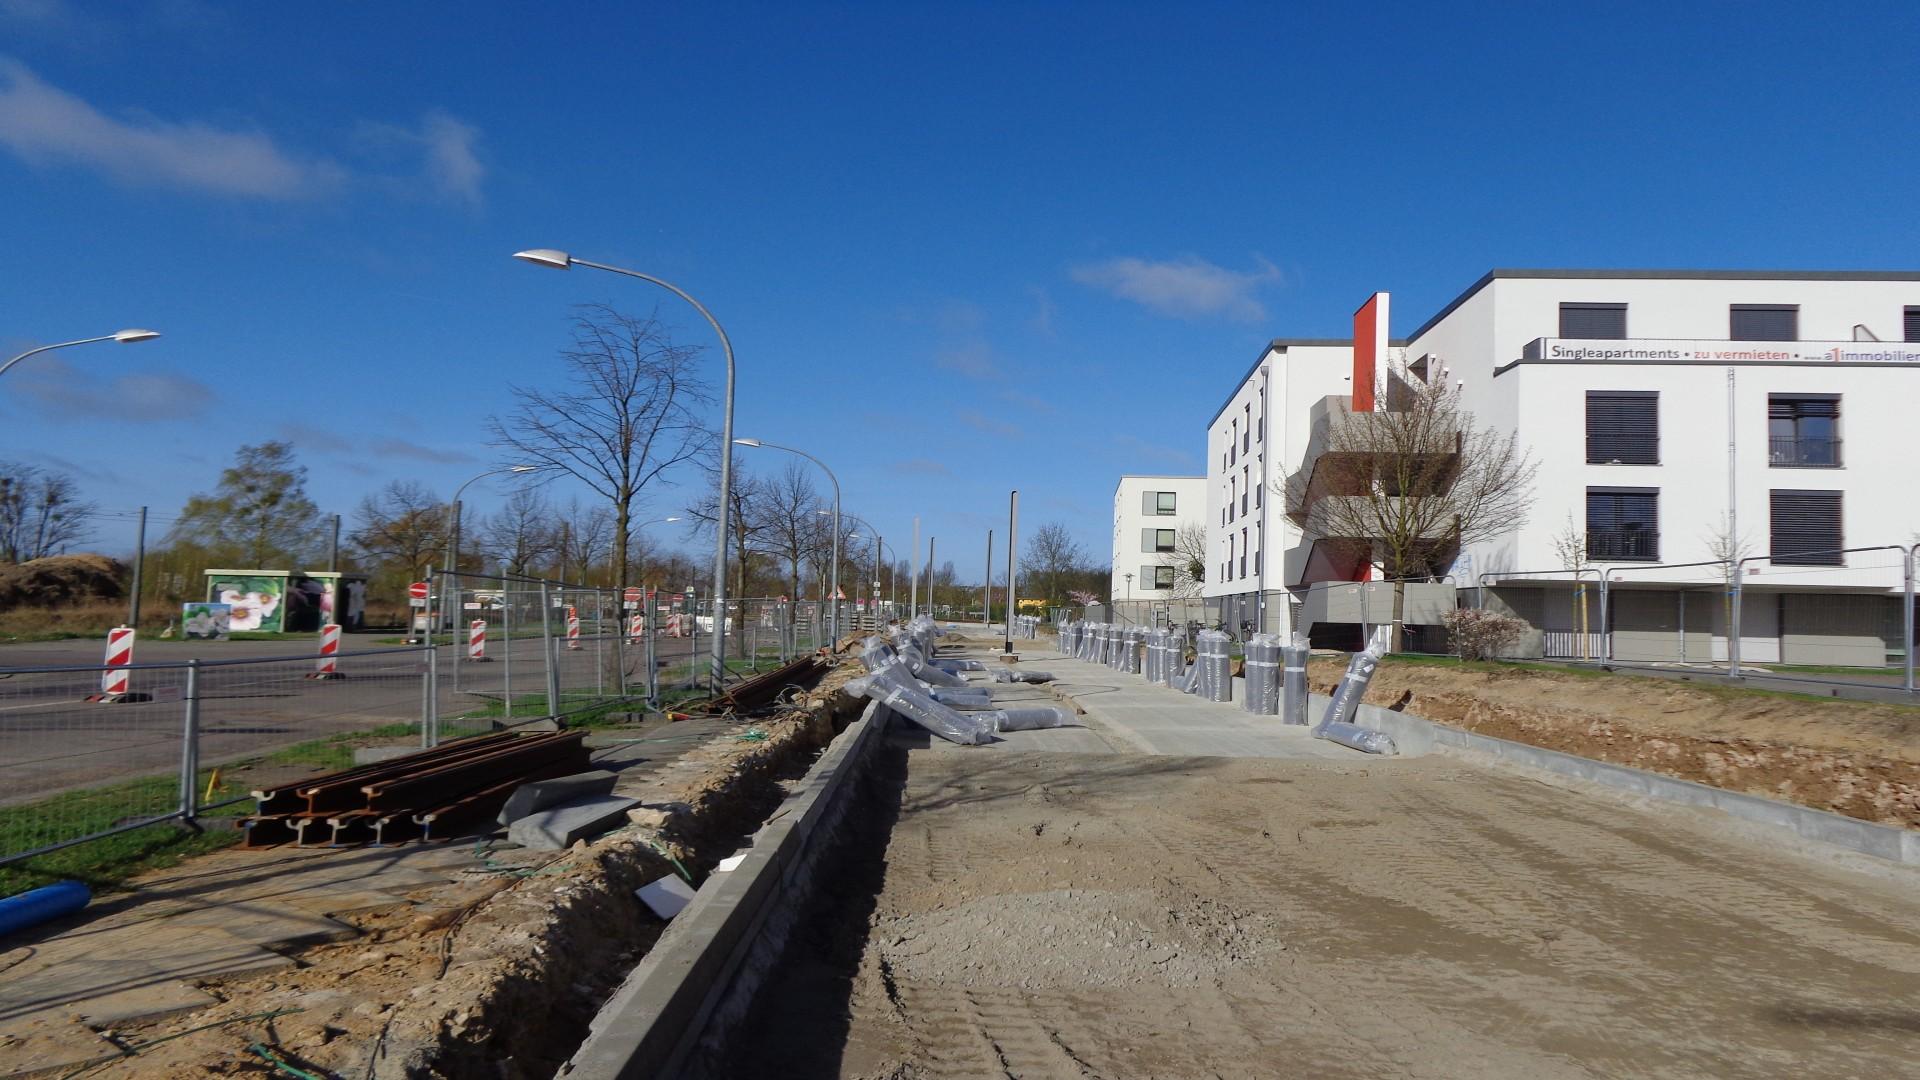 Straßenbahntrasse Georg Hermann Allee/Bereich Rote Kaserne 3